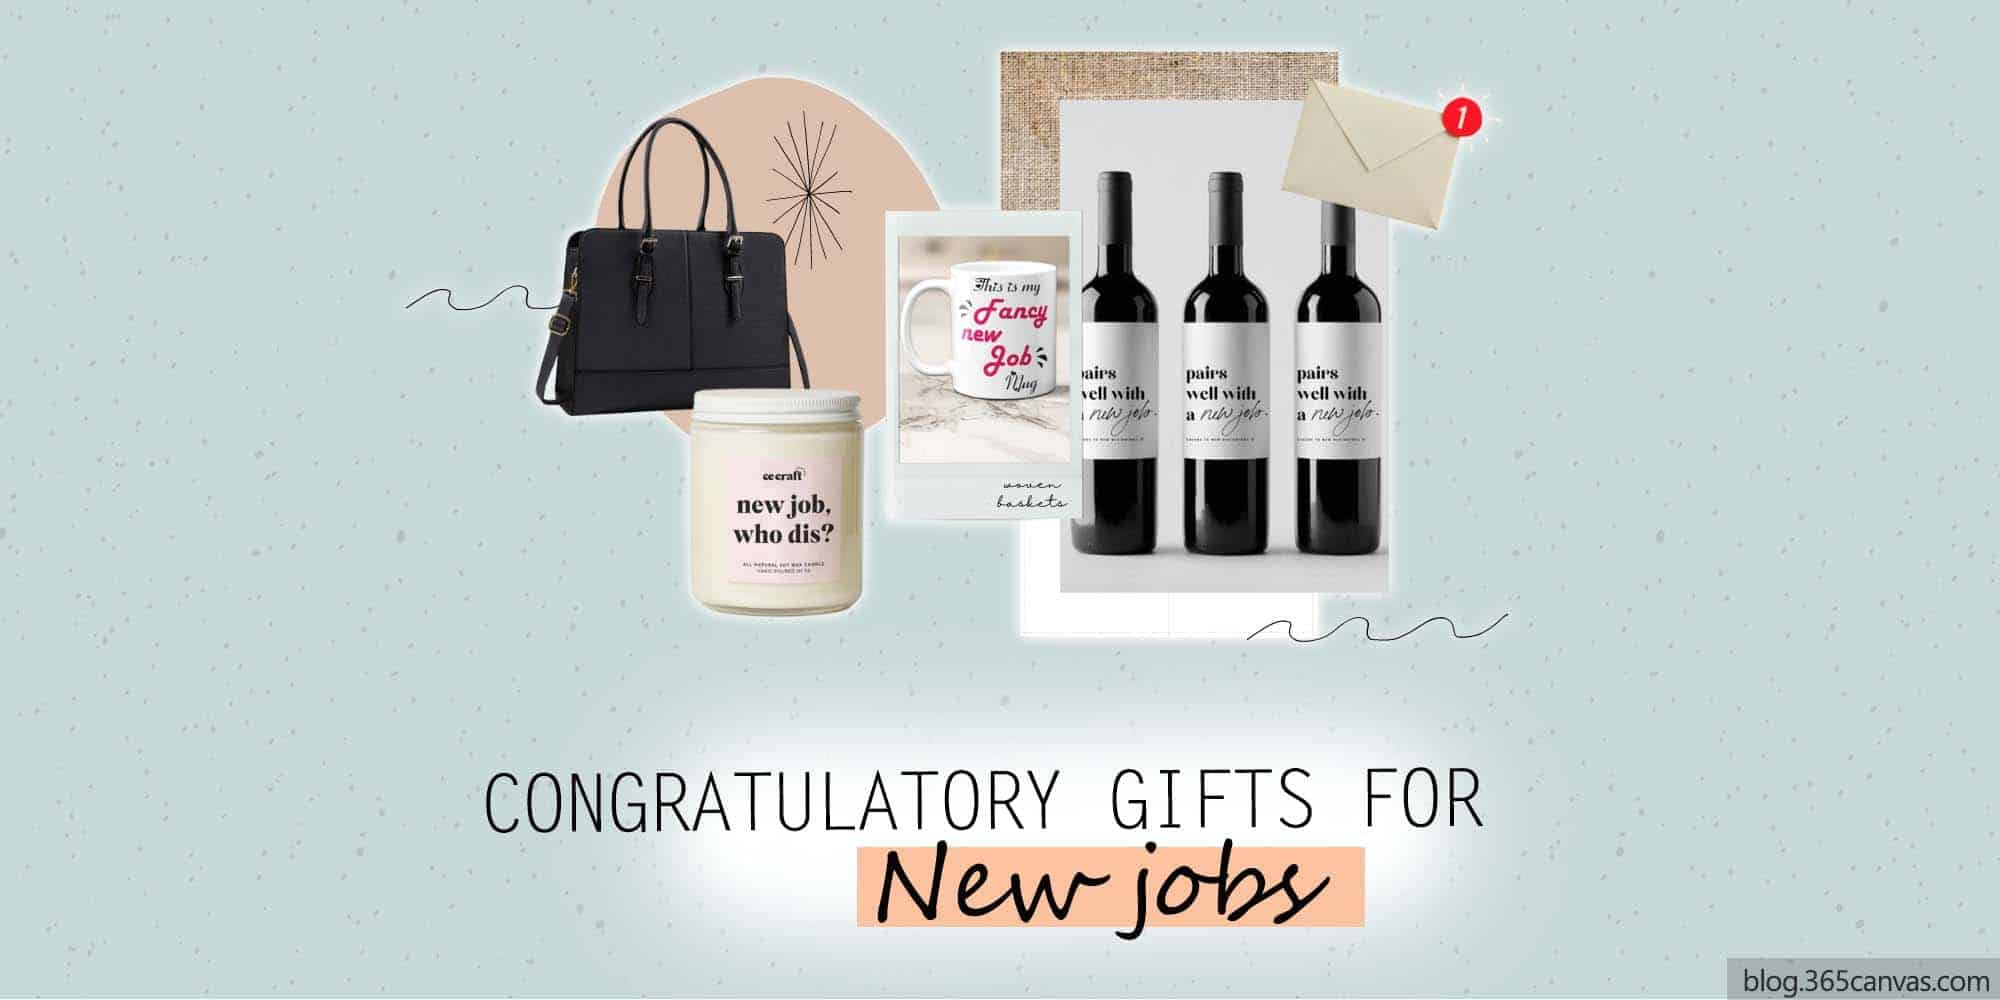 23 Congratulatory New Job Gift Ideas To Encourage Success (2021)